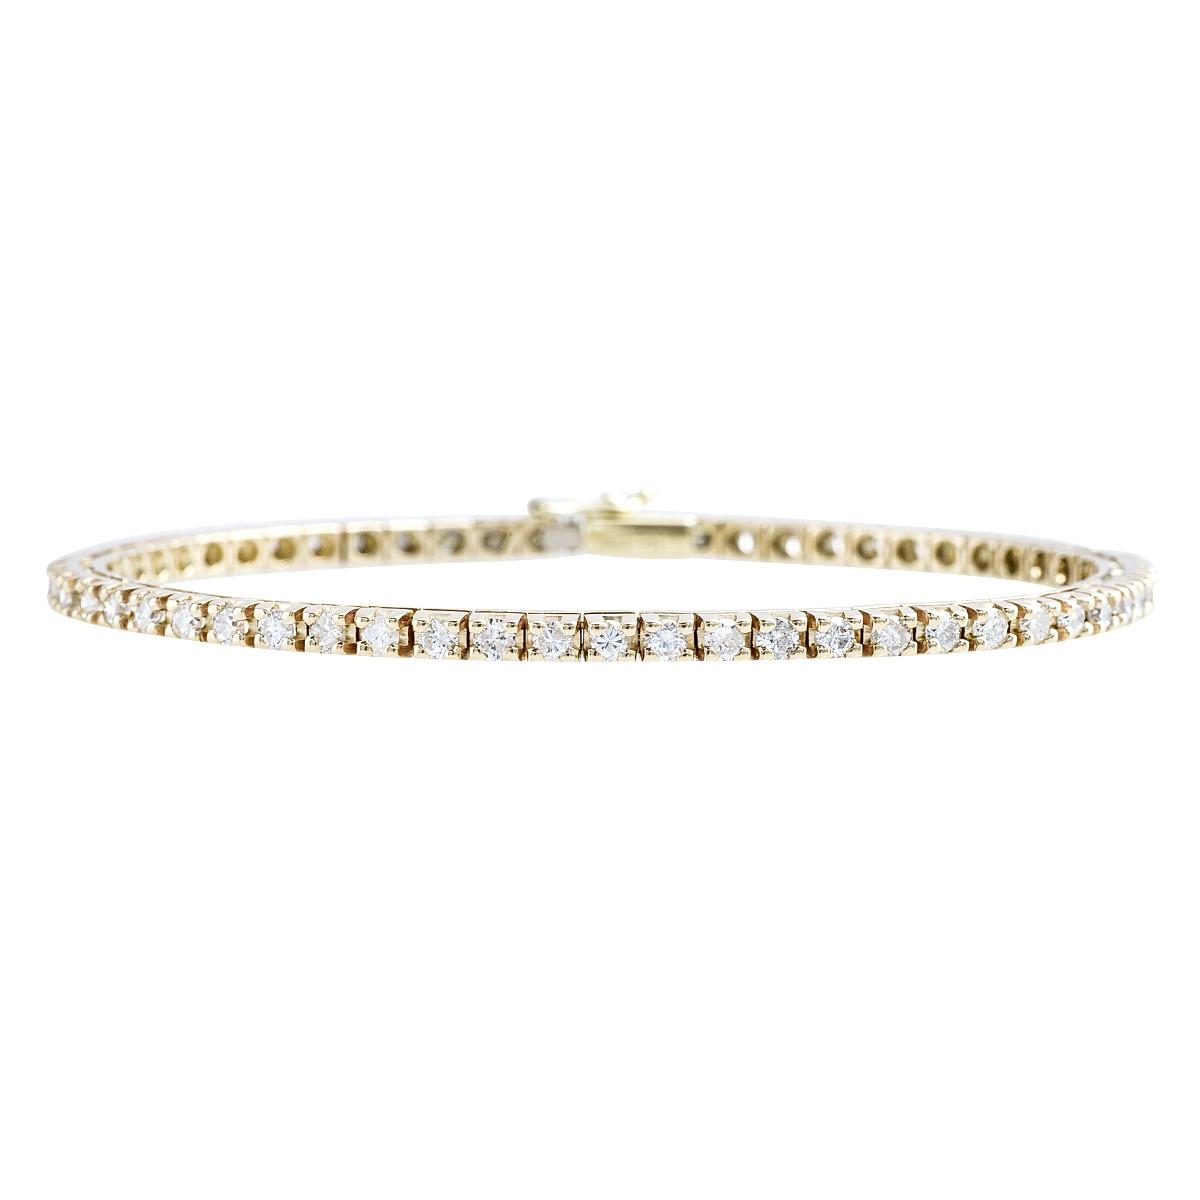 Vintage 2.32 CTW Diamond Tennis Bracelet